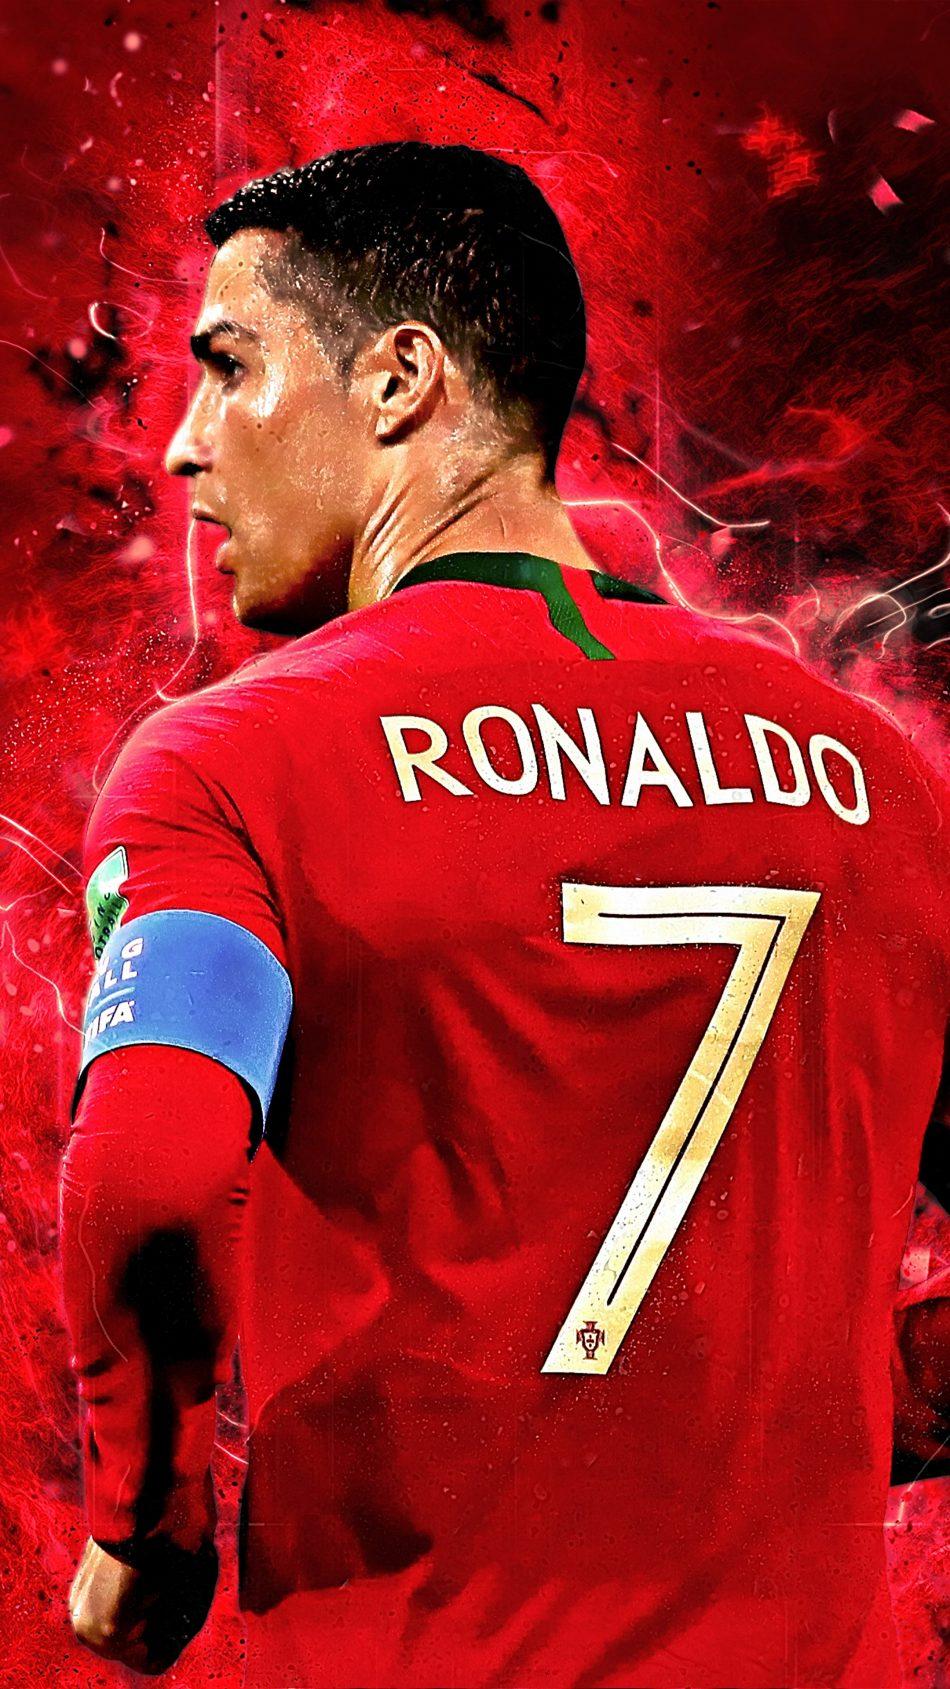 Cristiano Ronaldo Jersey Number 7 4K Ultra HD Mobile Wallpaper 950x1689